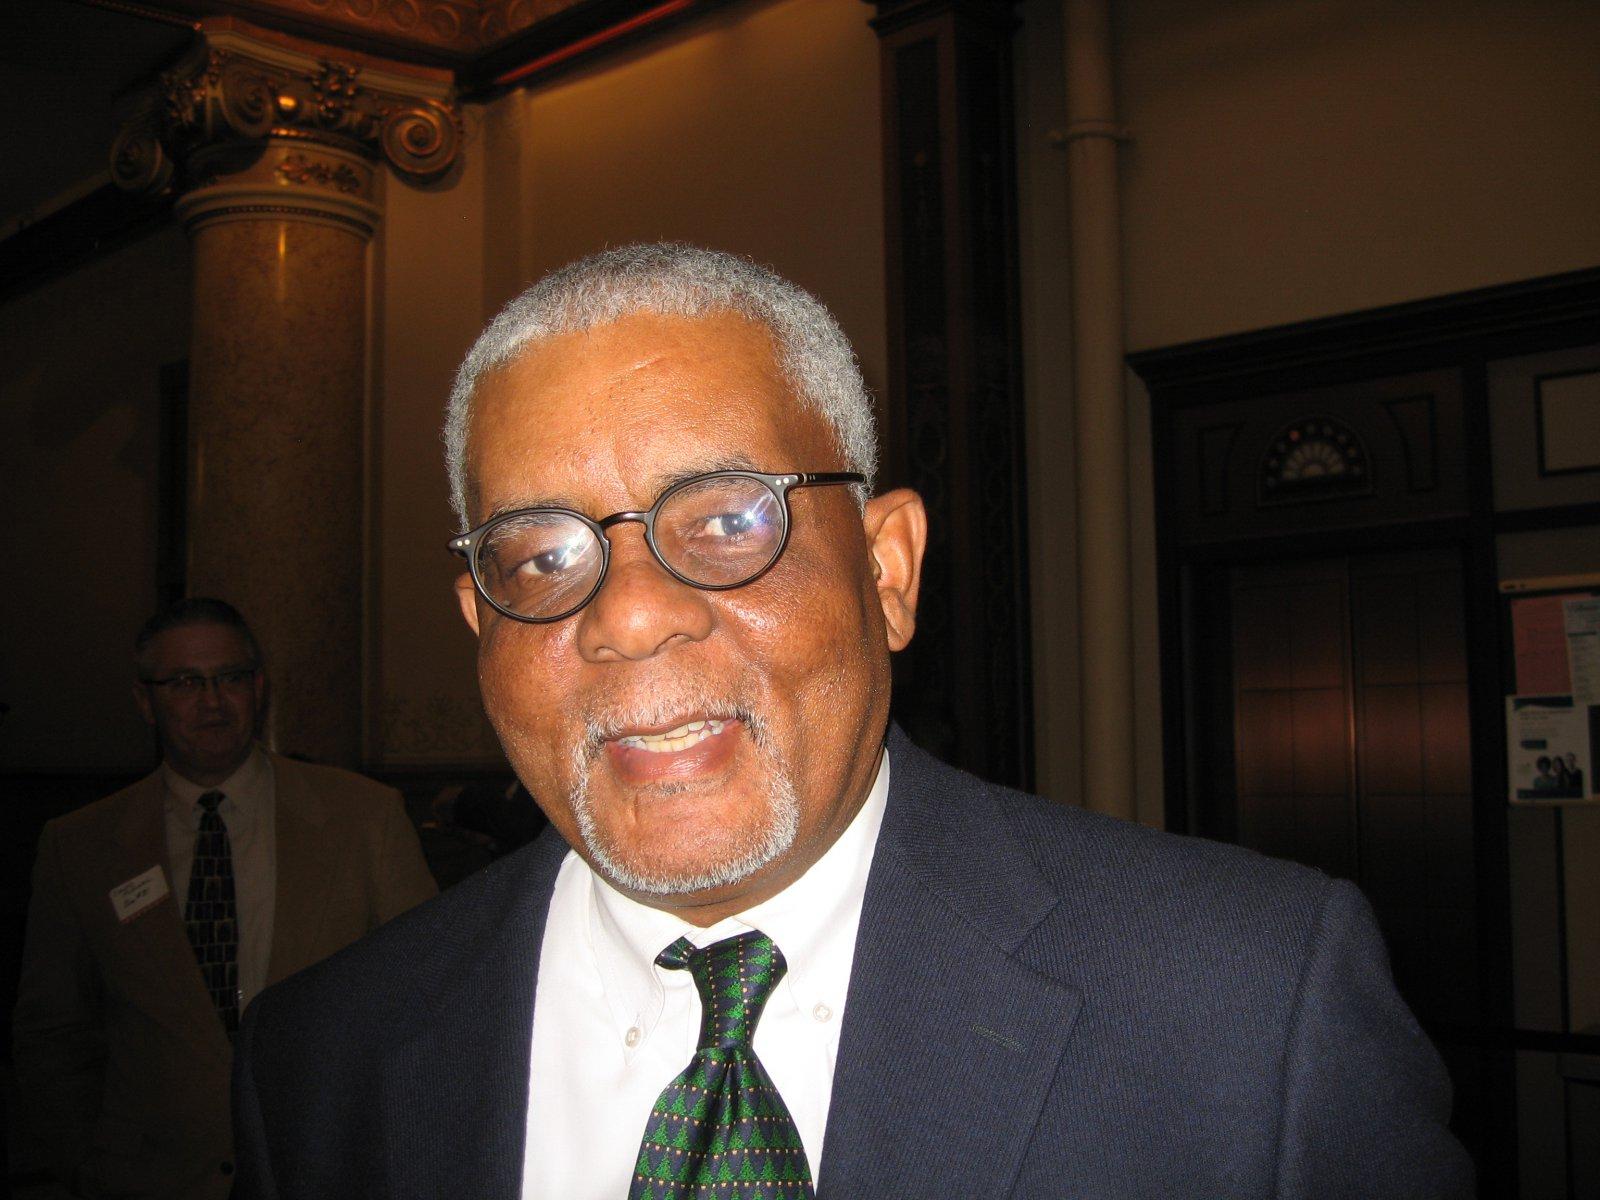 Kenneth Little